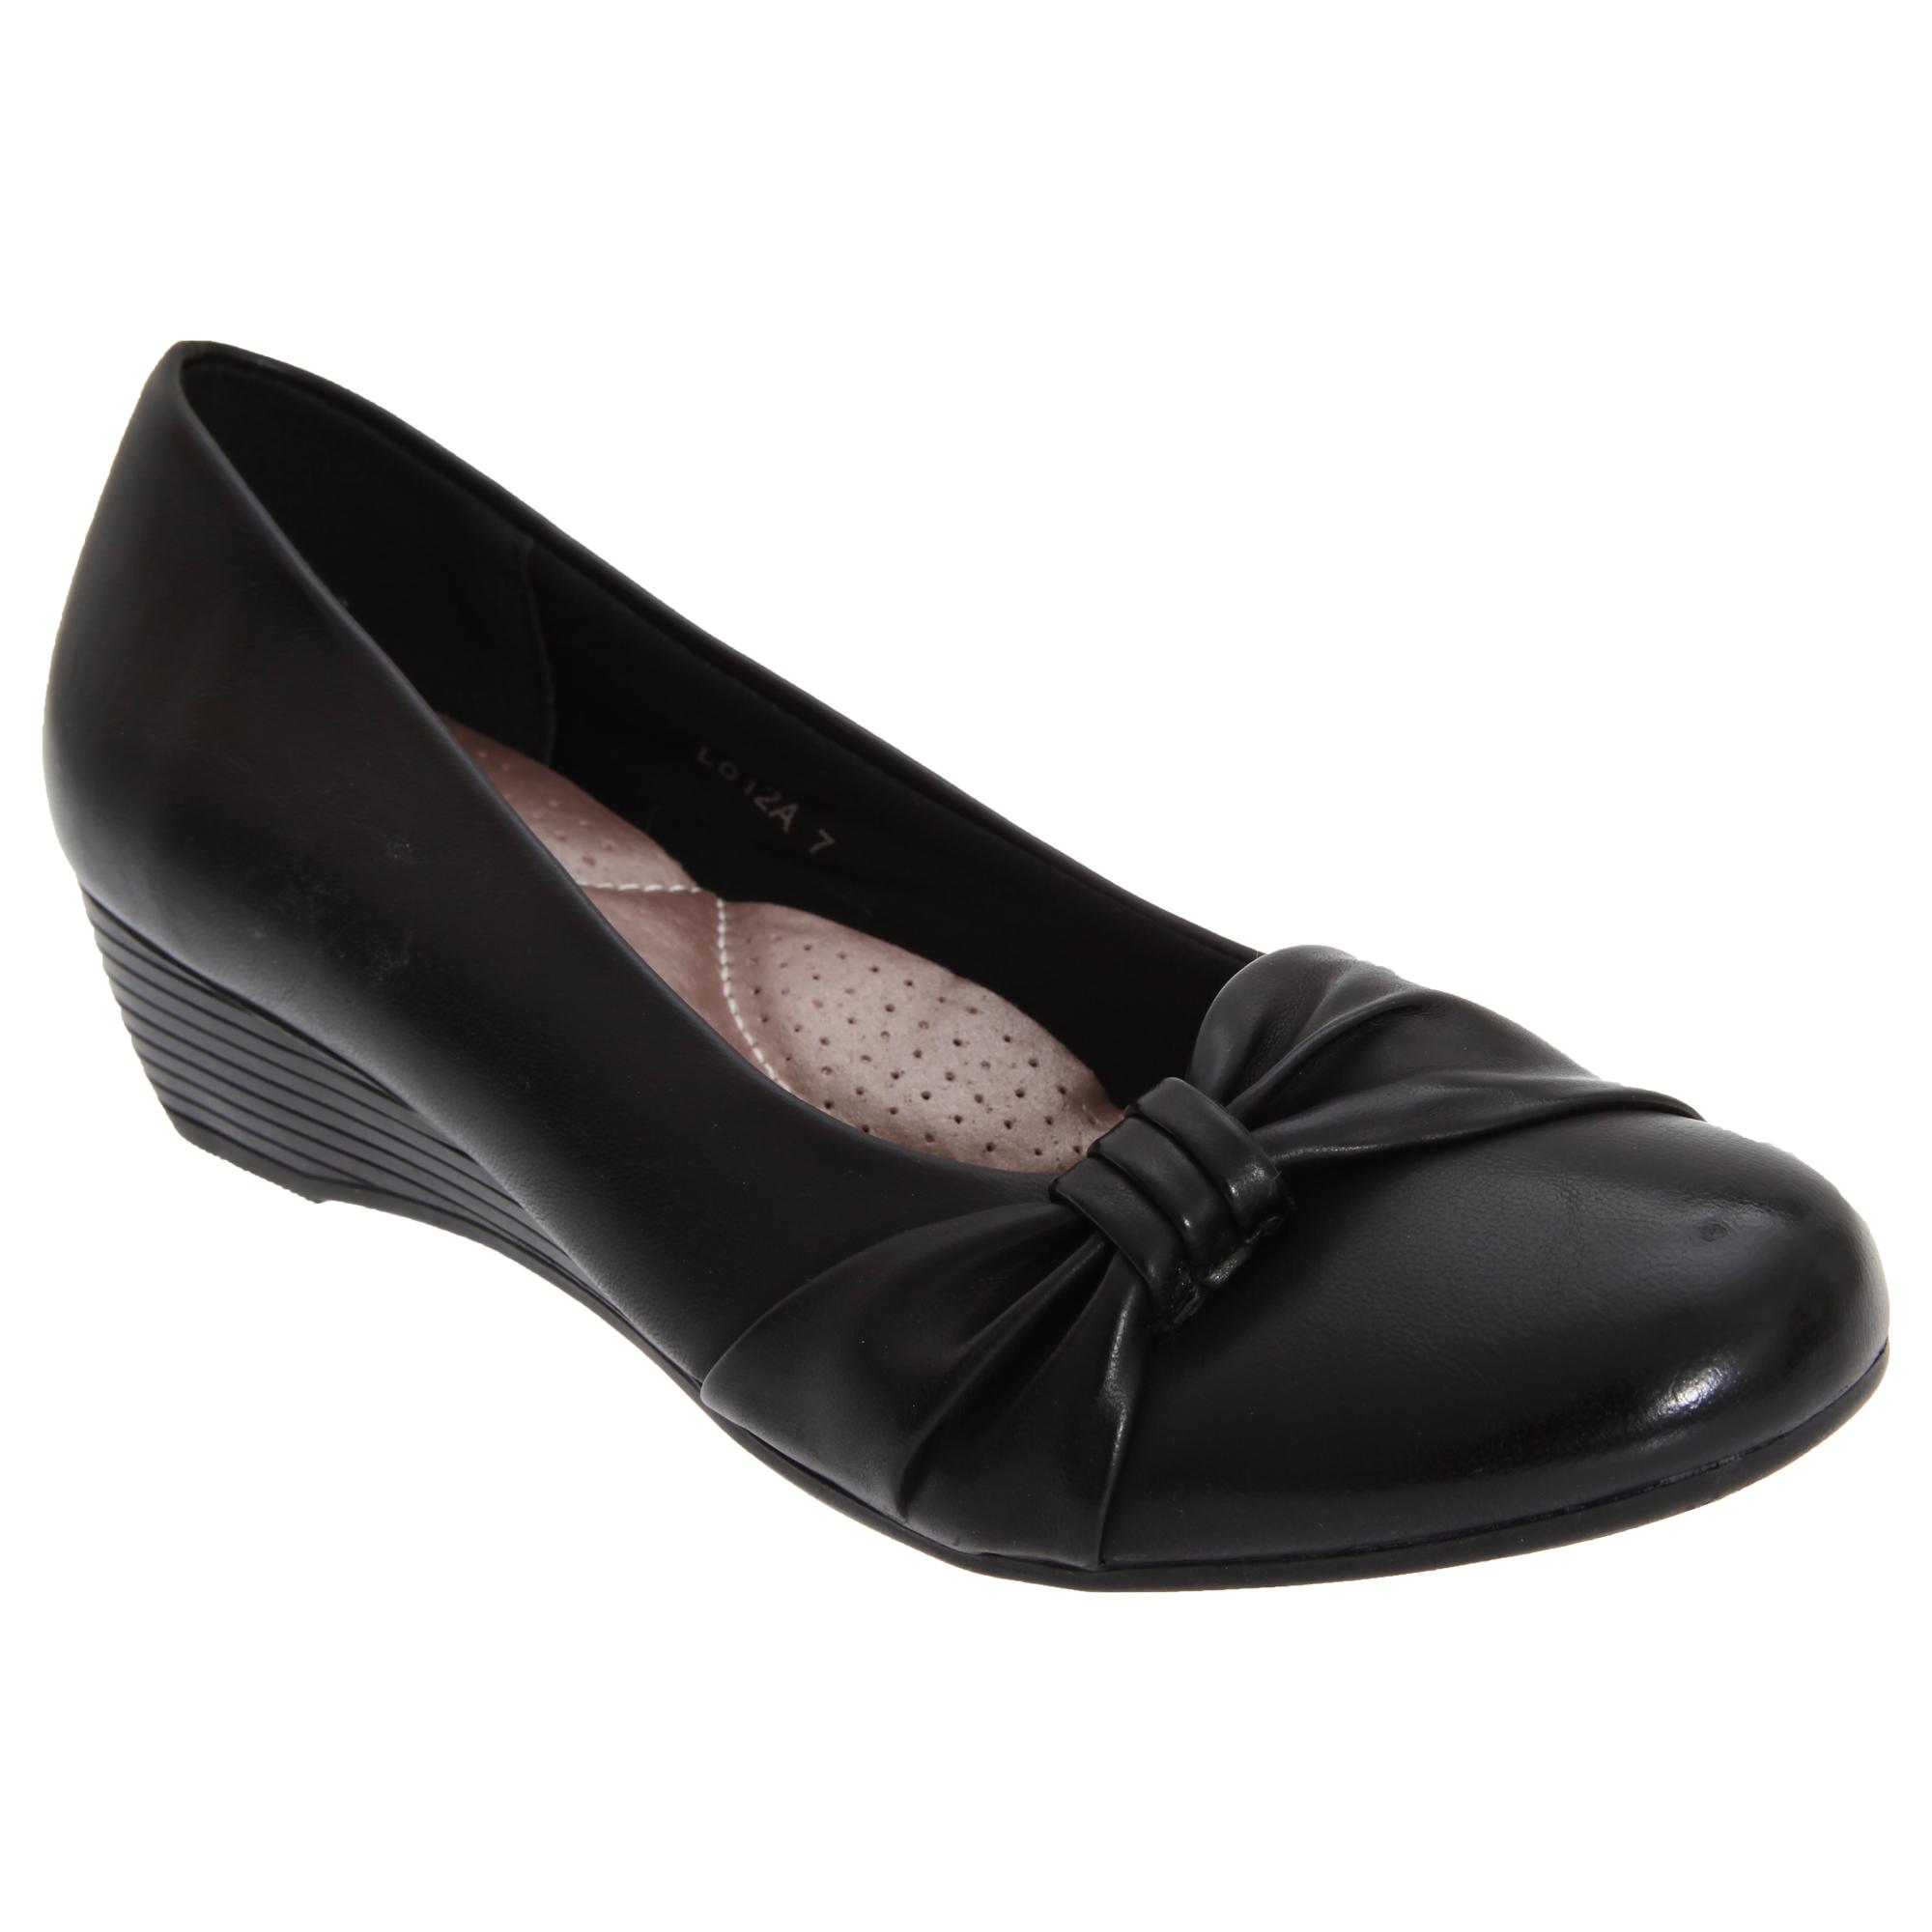 Amazon Womens Dress Shoes Size